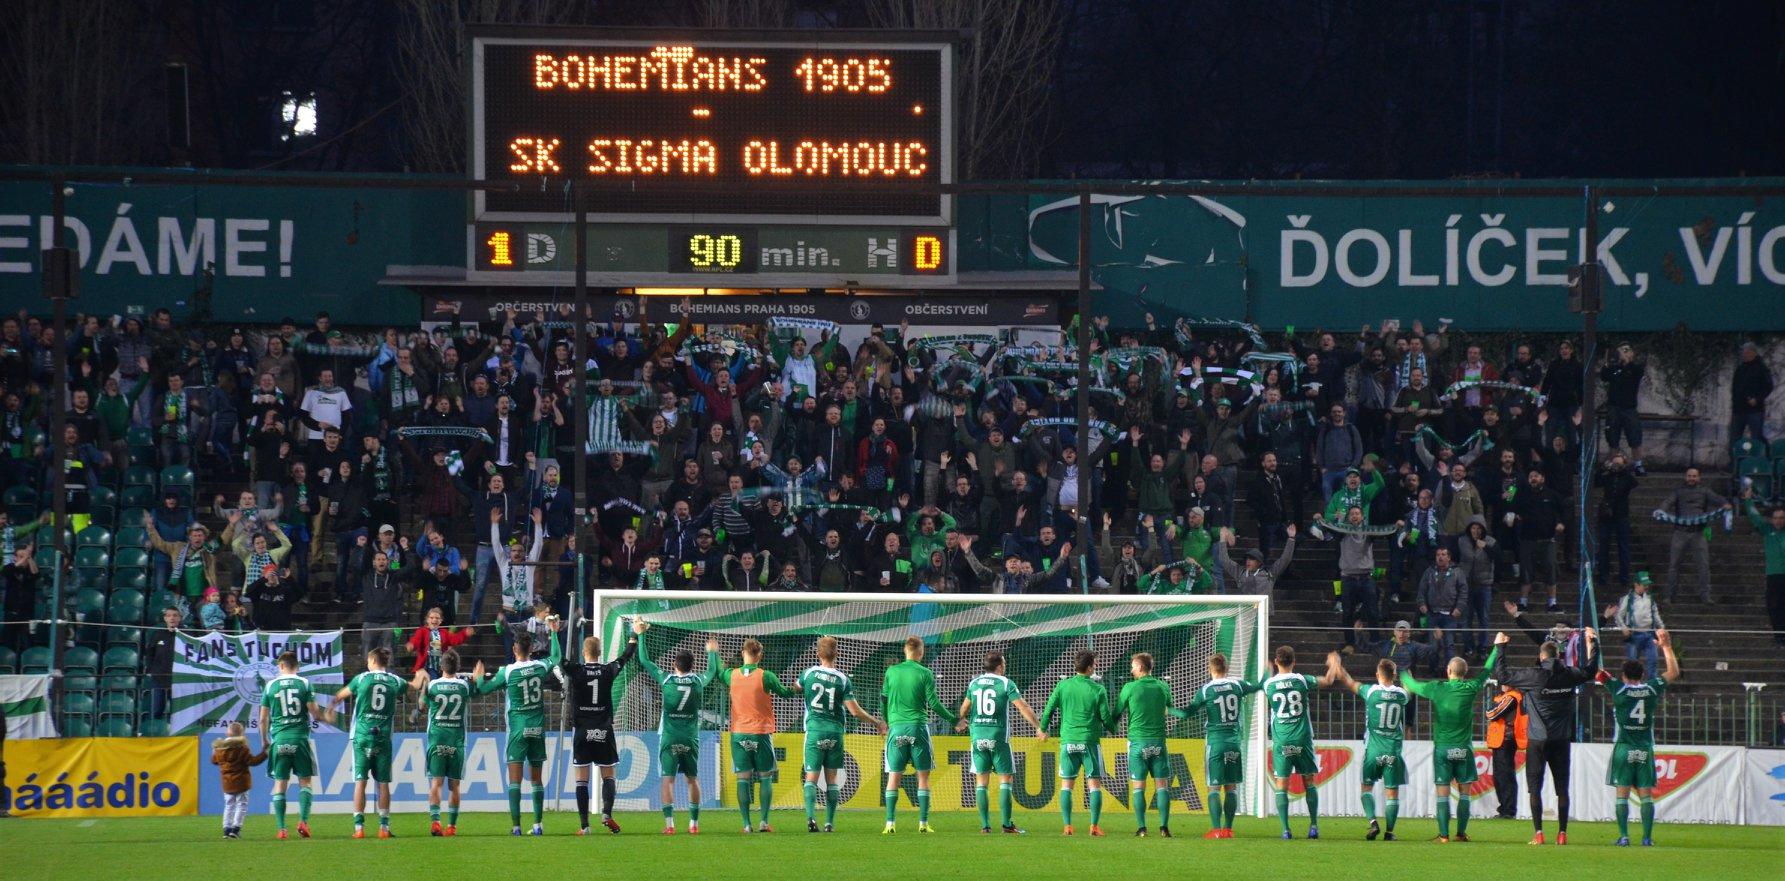 Bohemians Praha 1905 – SK Sigma Olomouc 1:0